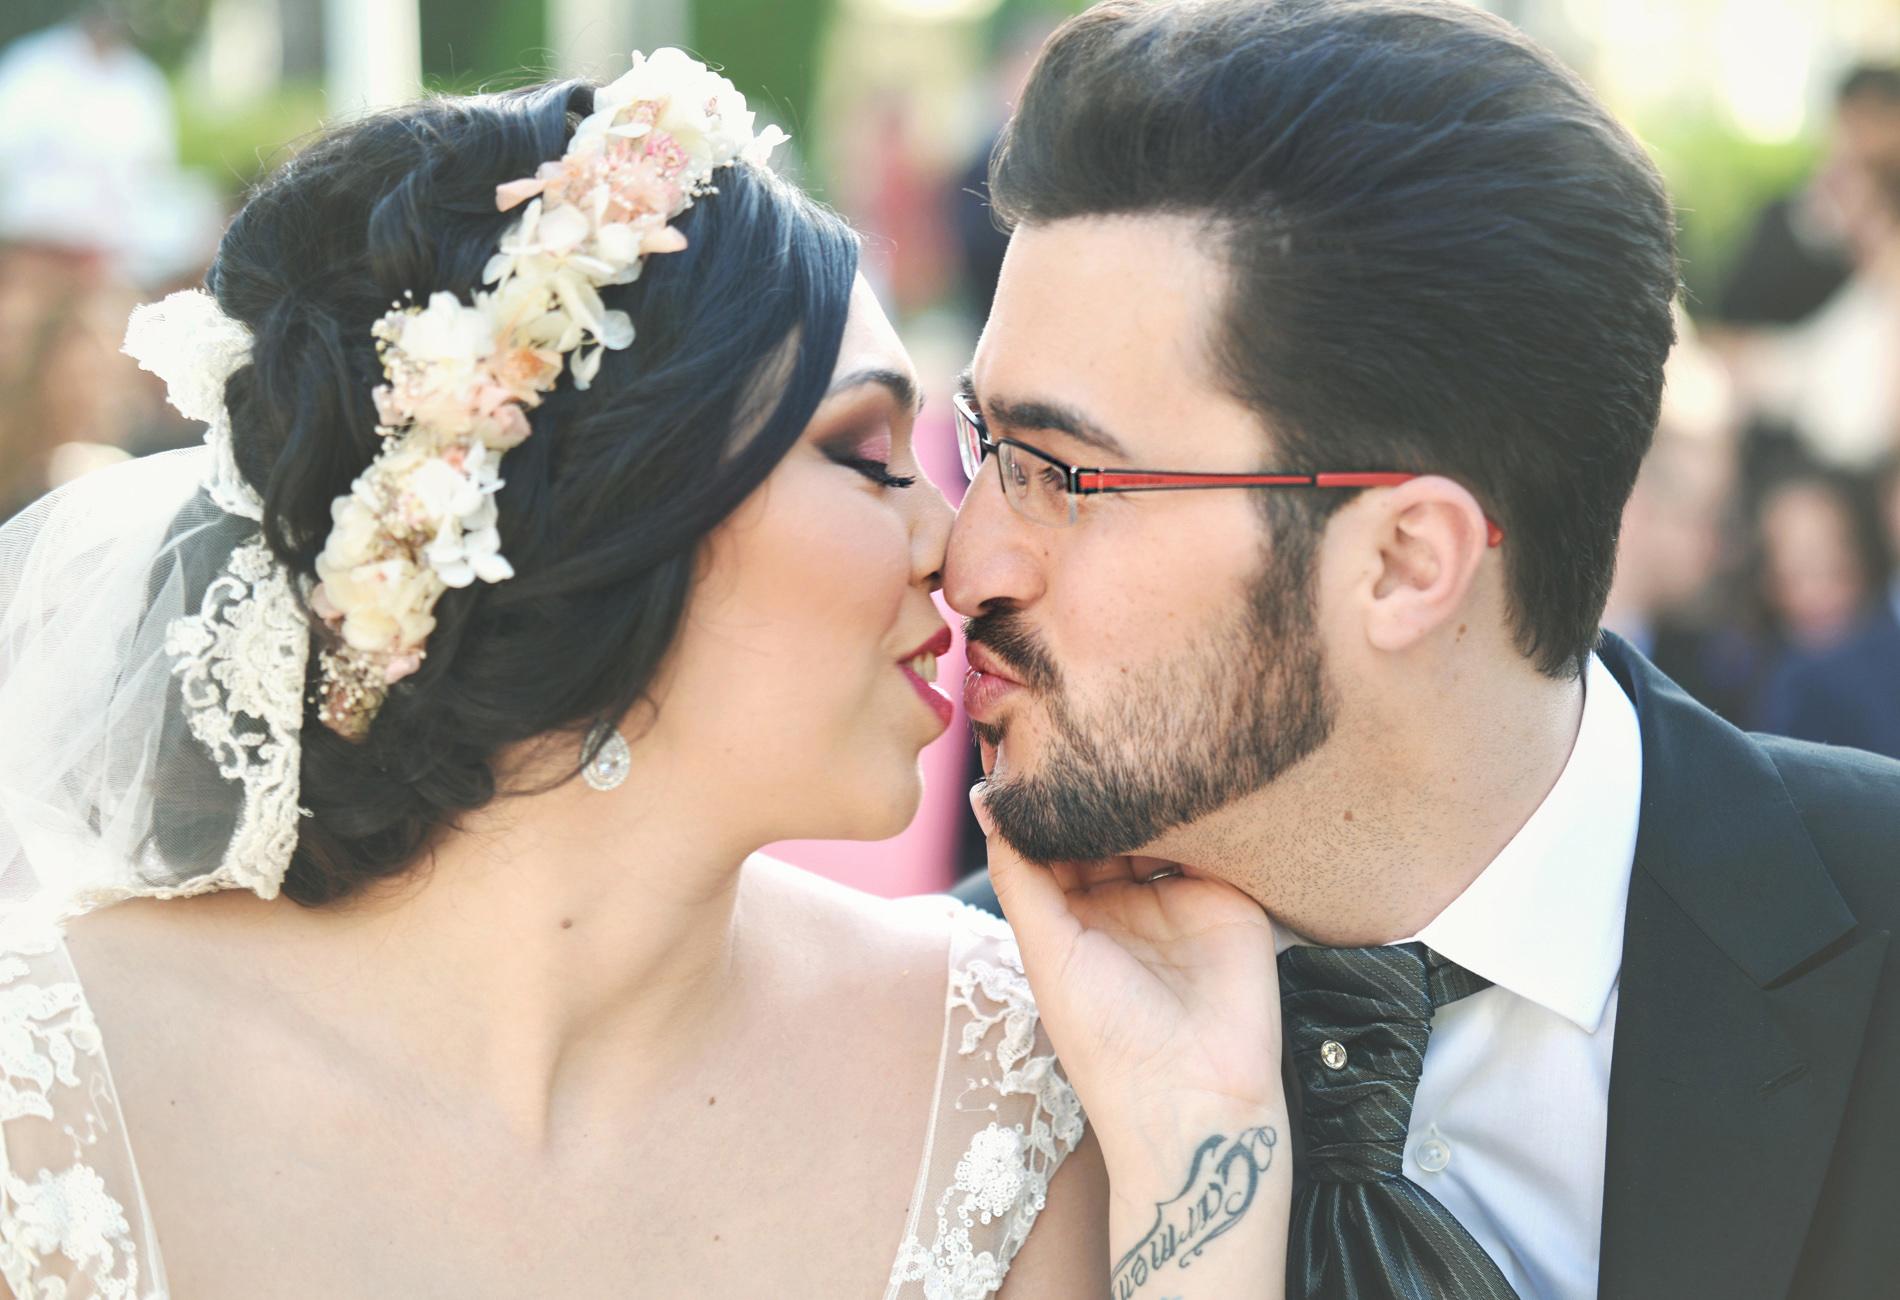 bodakids fotografos de boda (1)